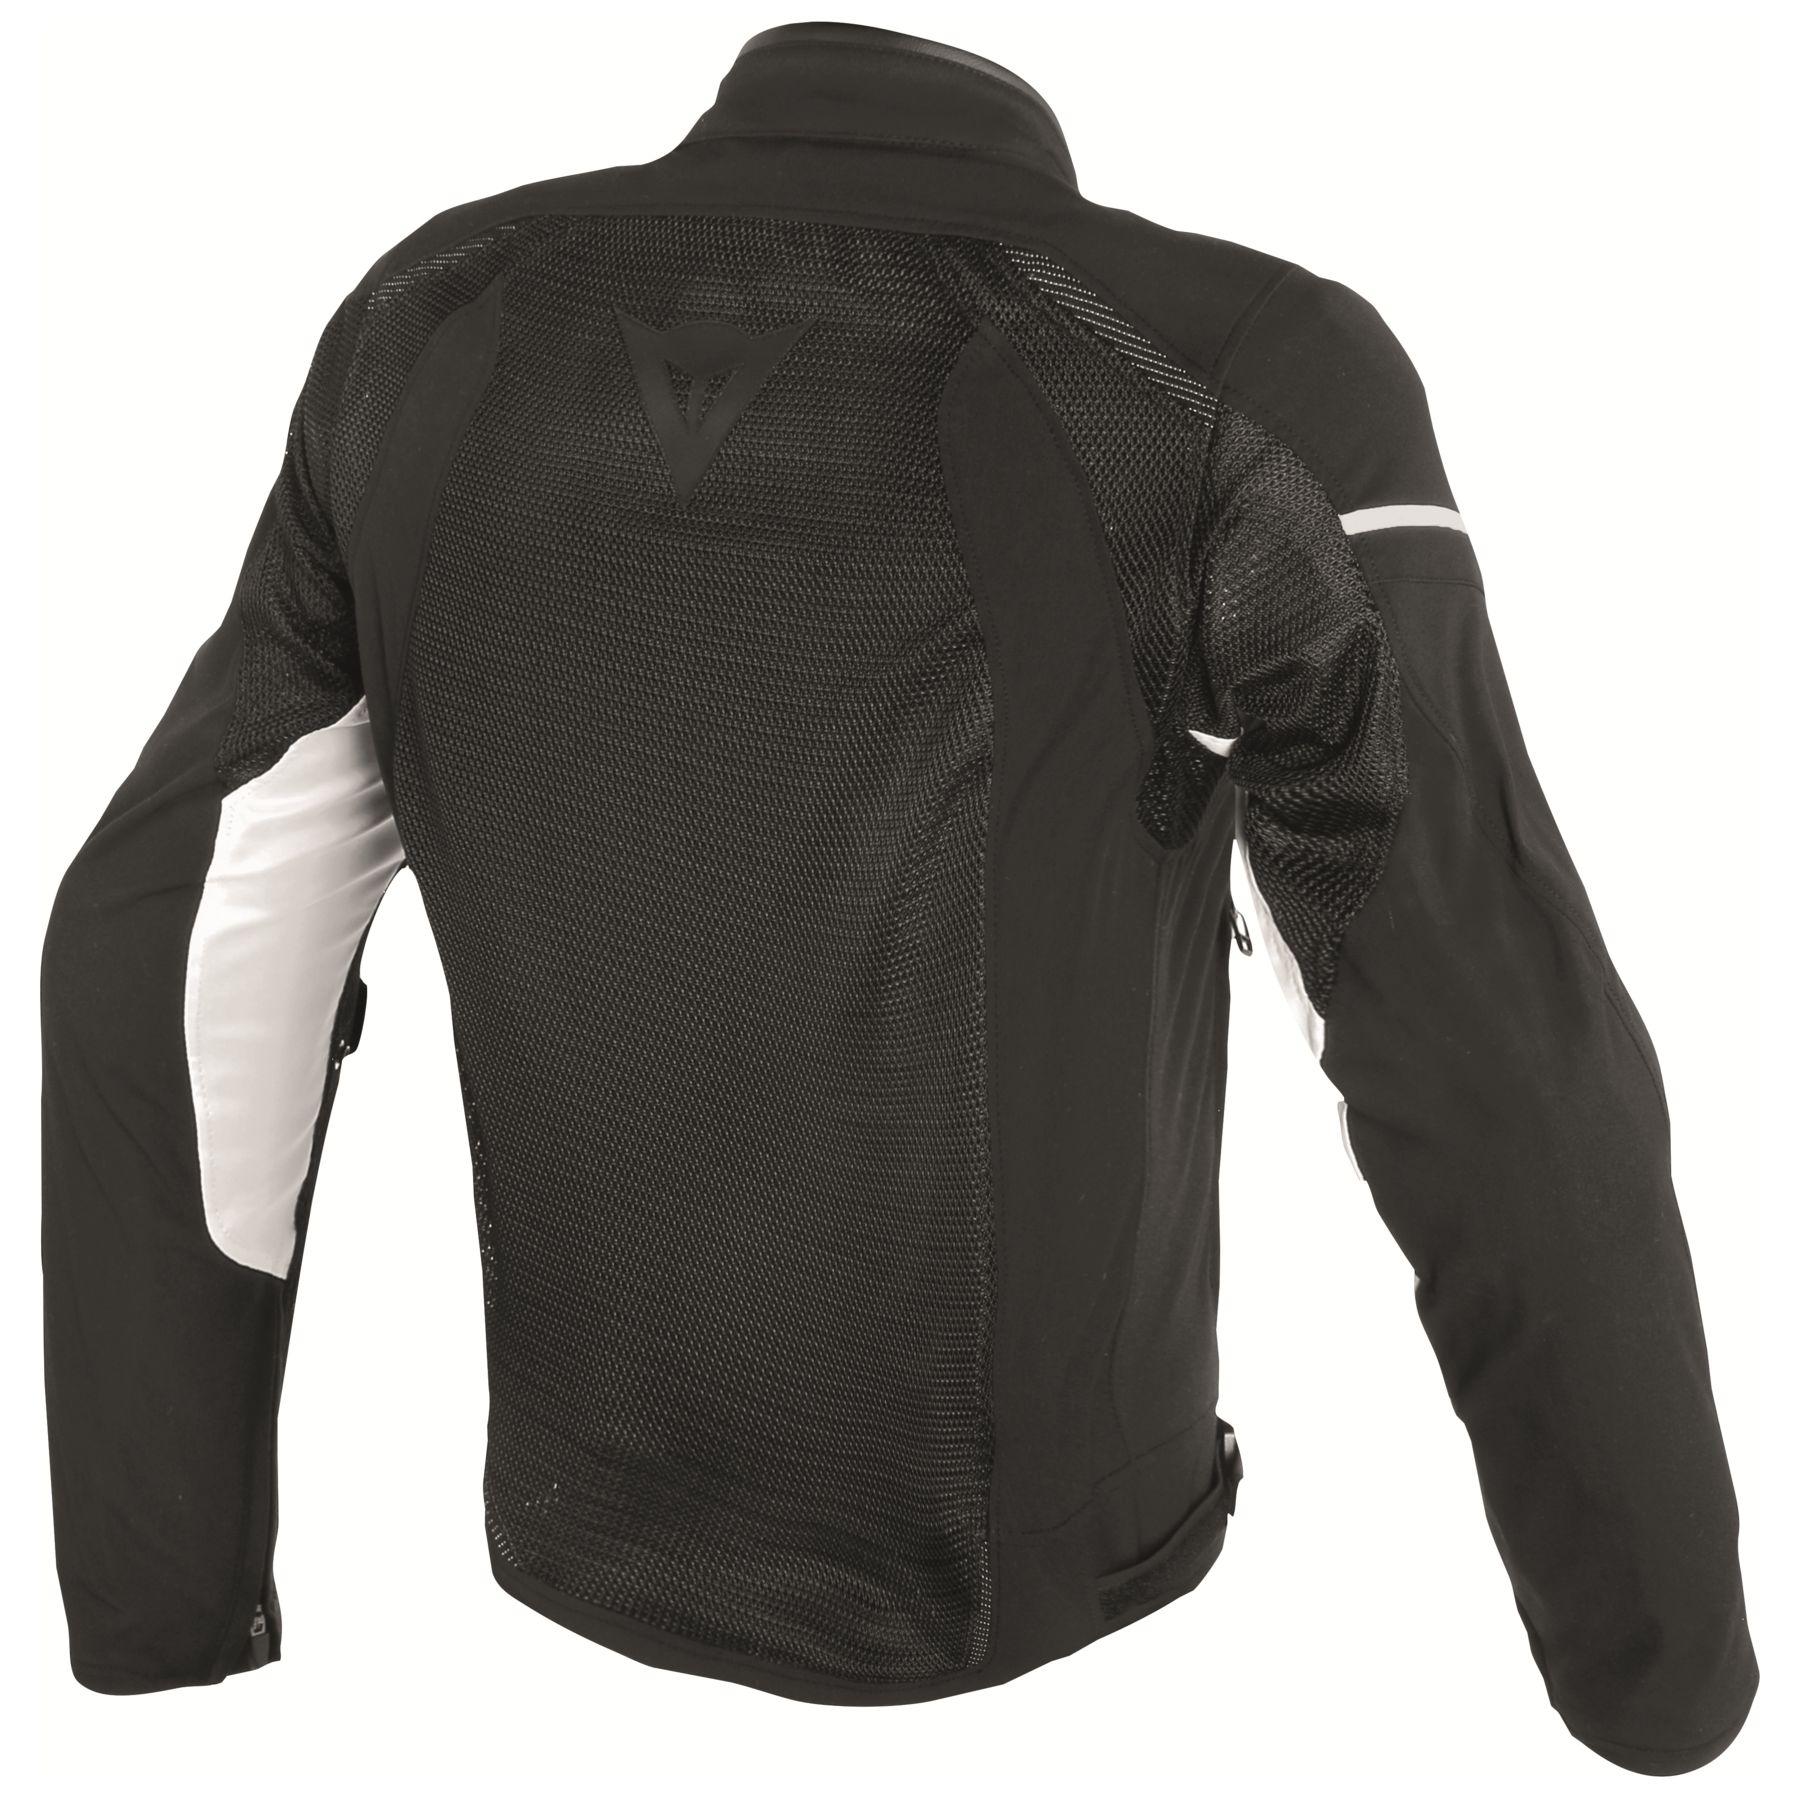 Dainese Air Frame D1 Jacket Mens Road Gear Jackets